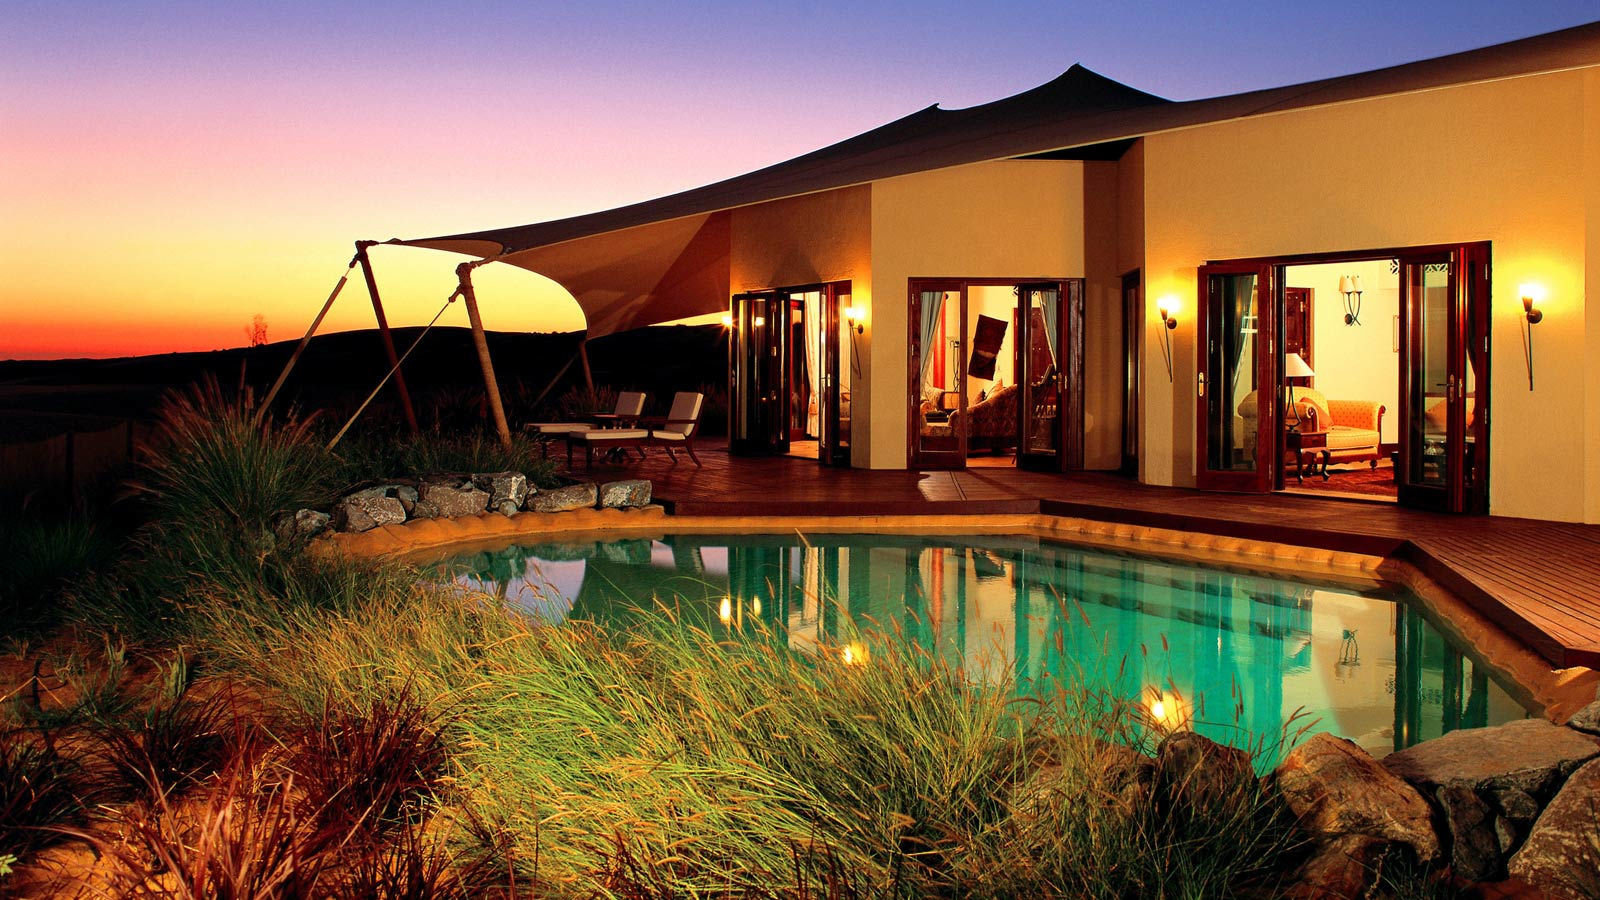 property home Resort swimming pool lighting sky evening house Villa water leisure hacienda amenity